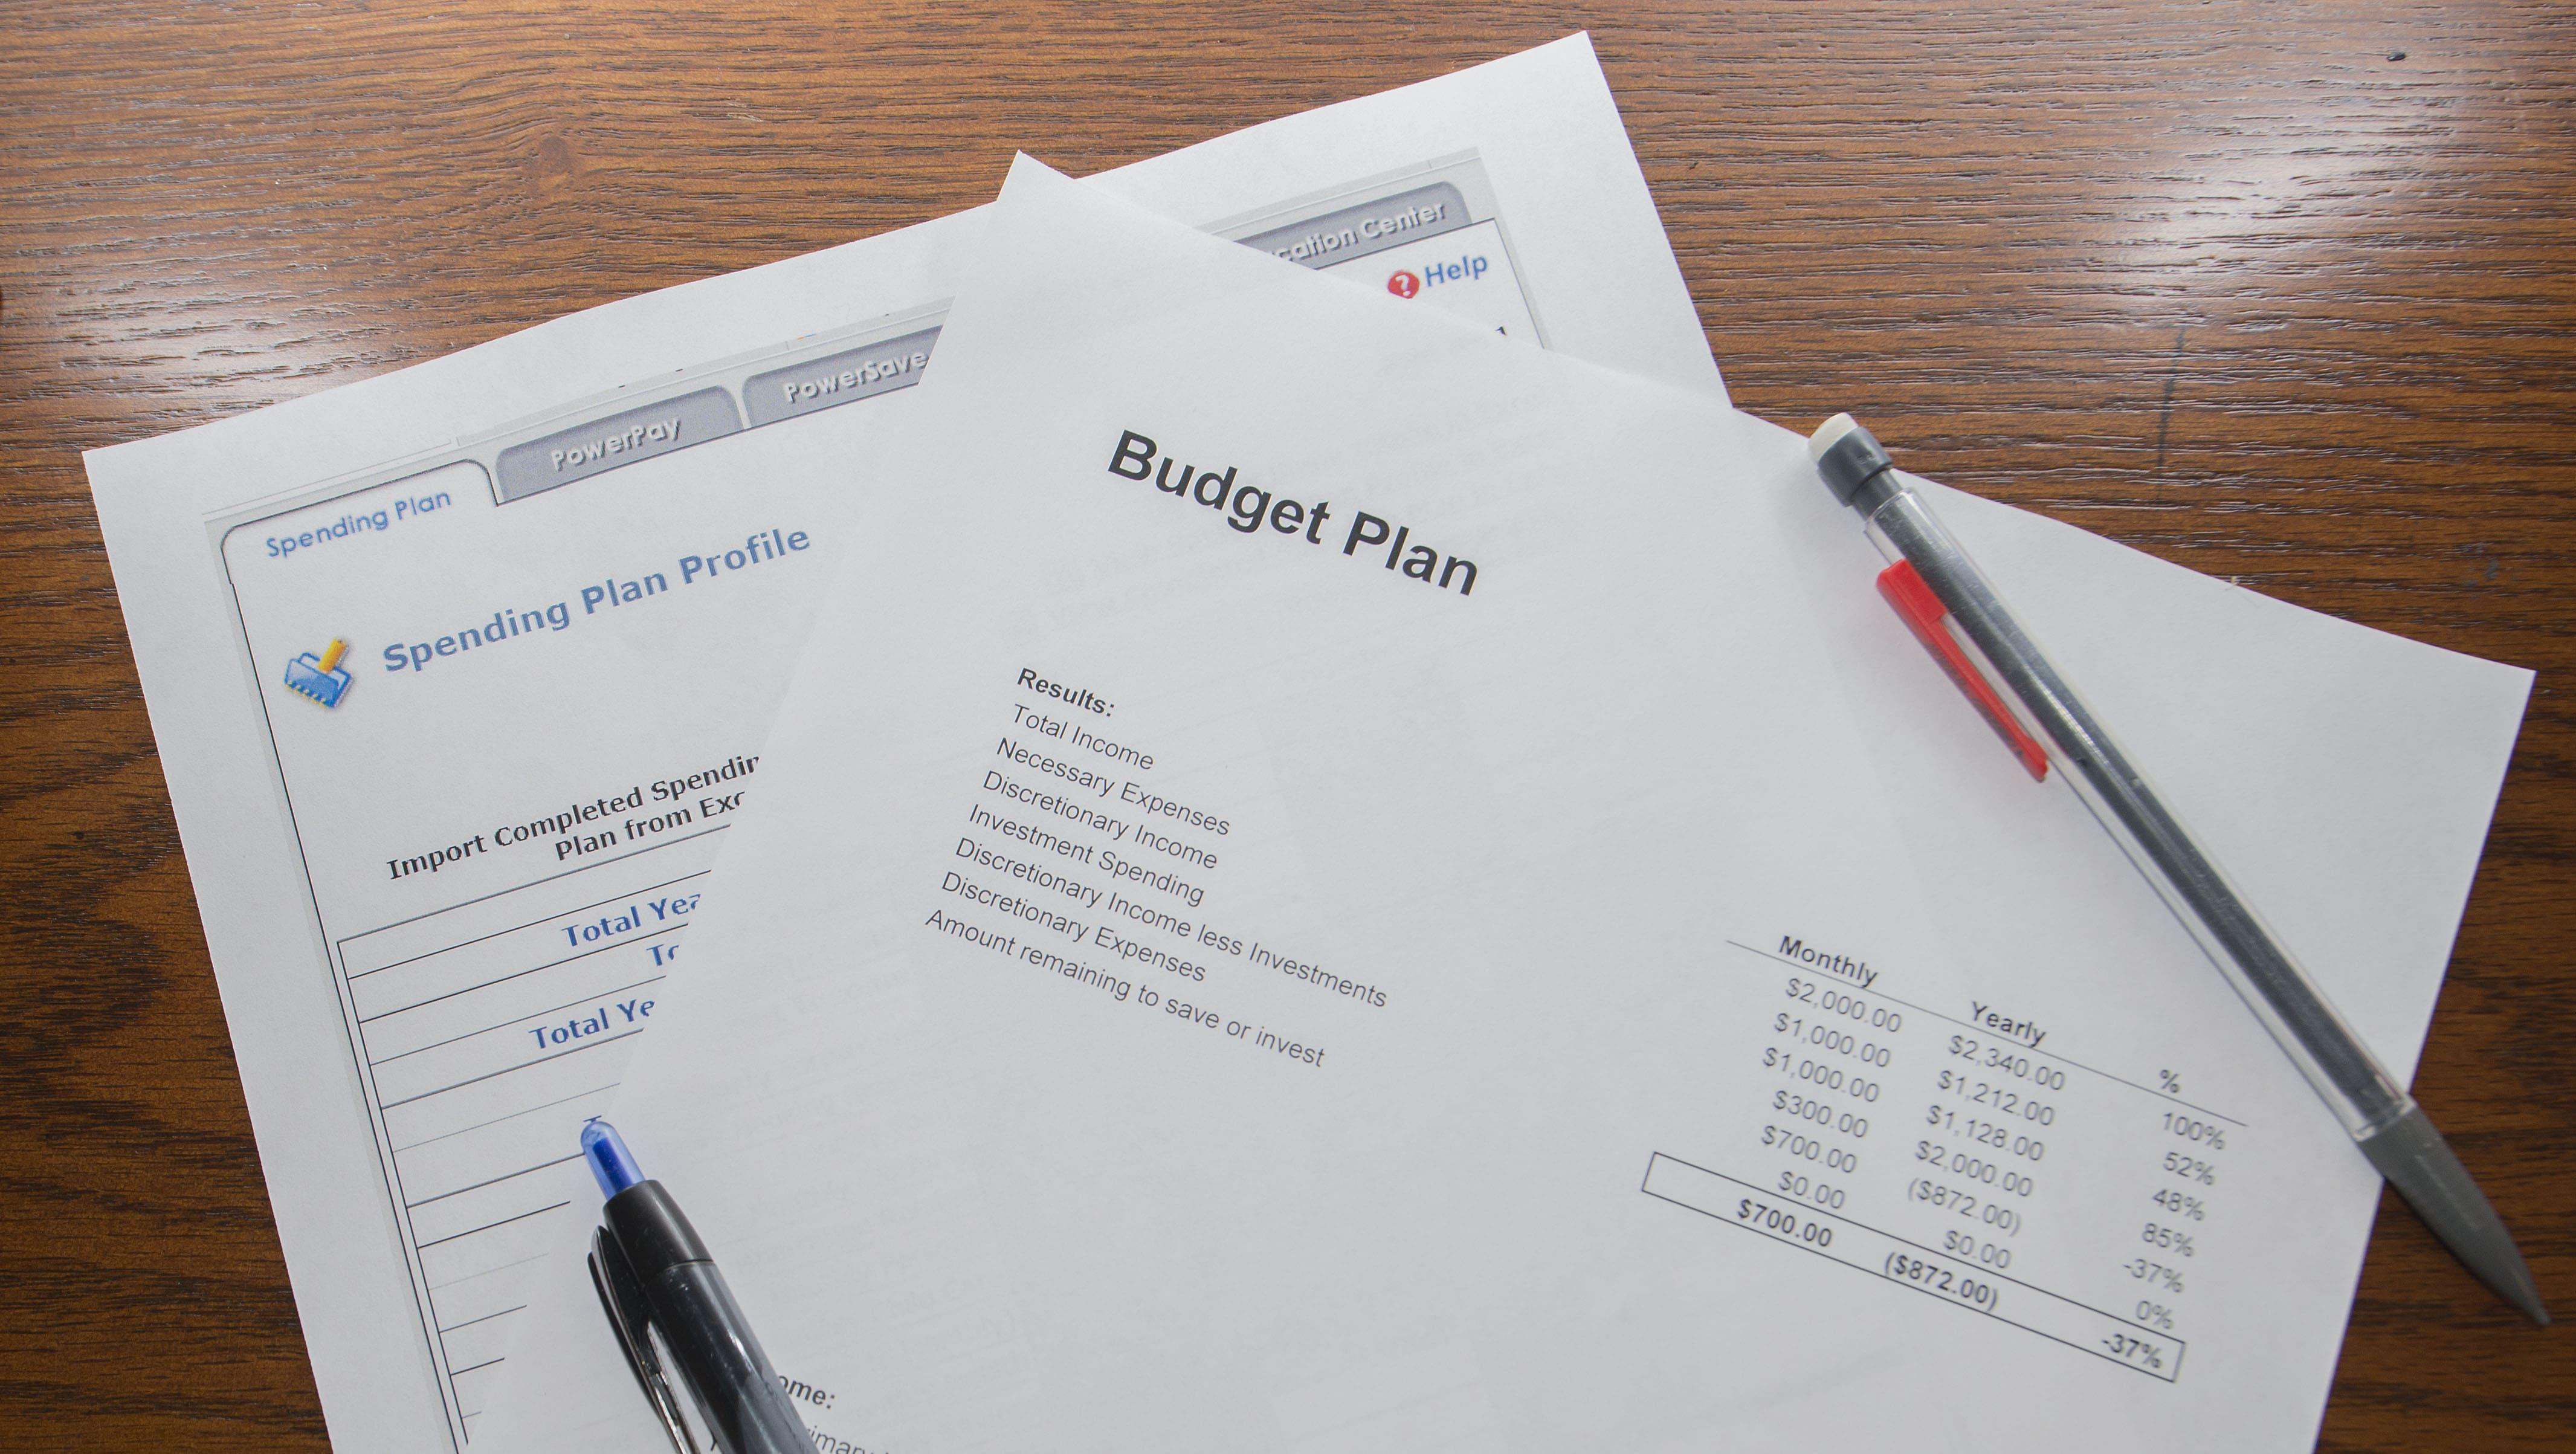 How to write a budget: Bottom Up